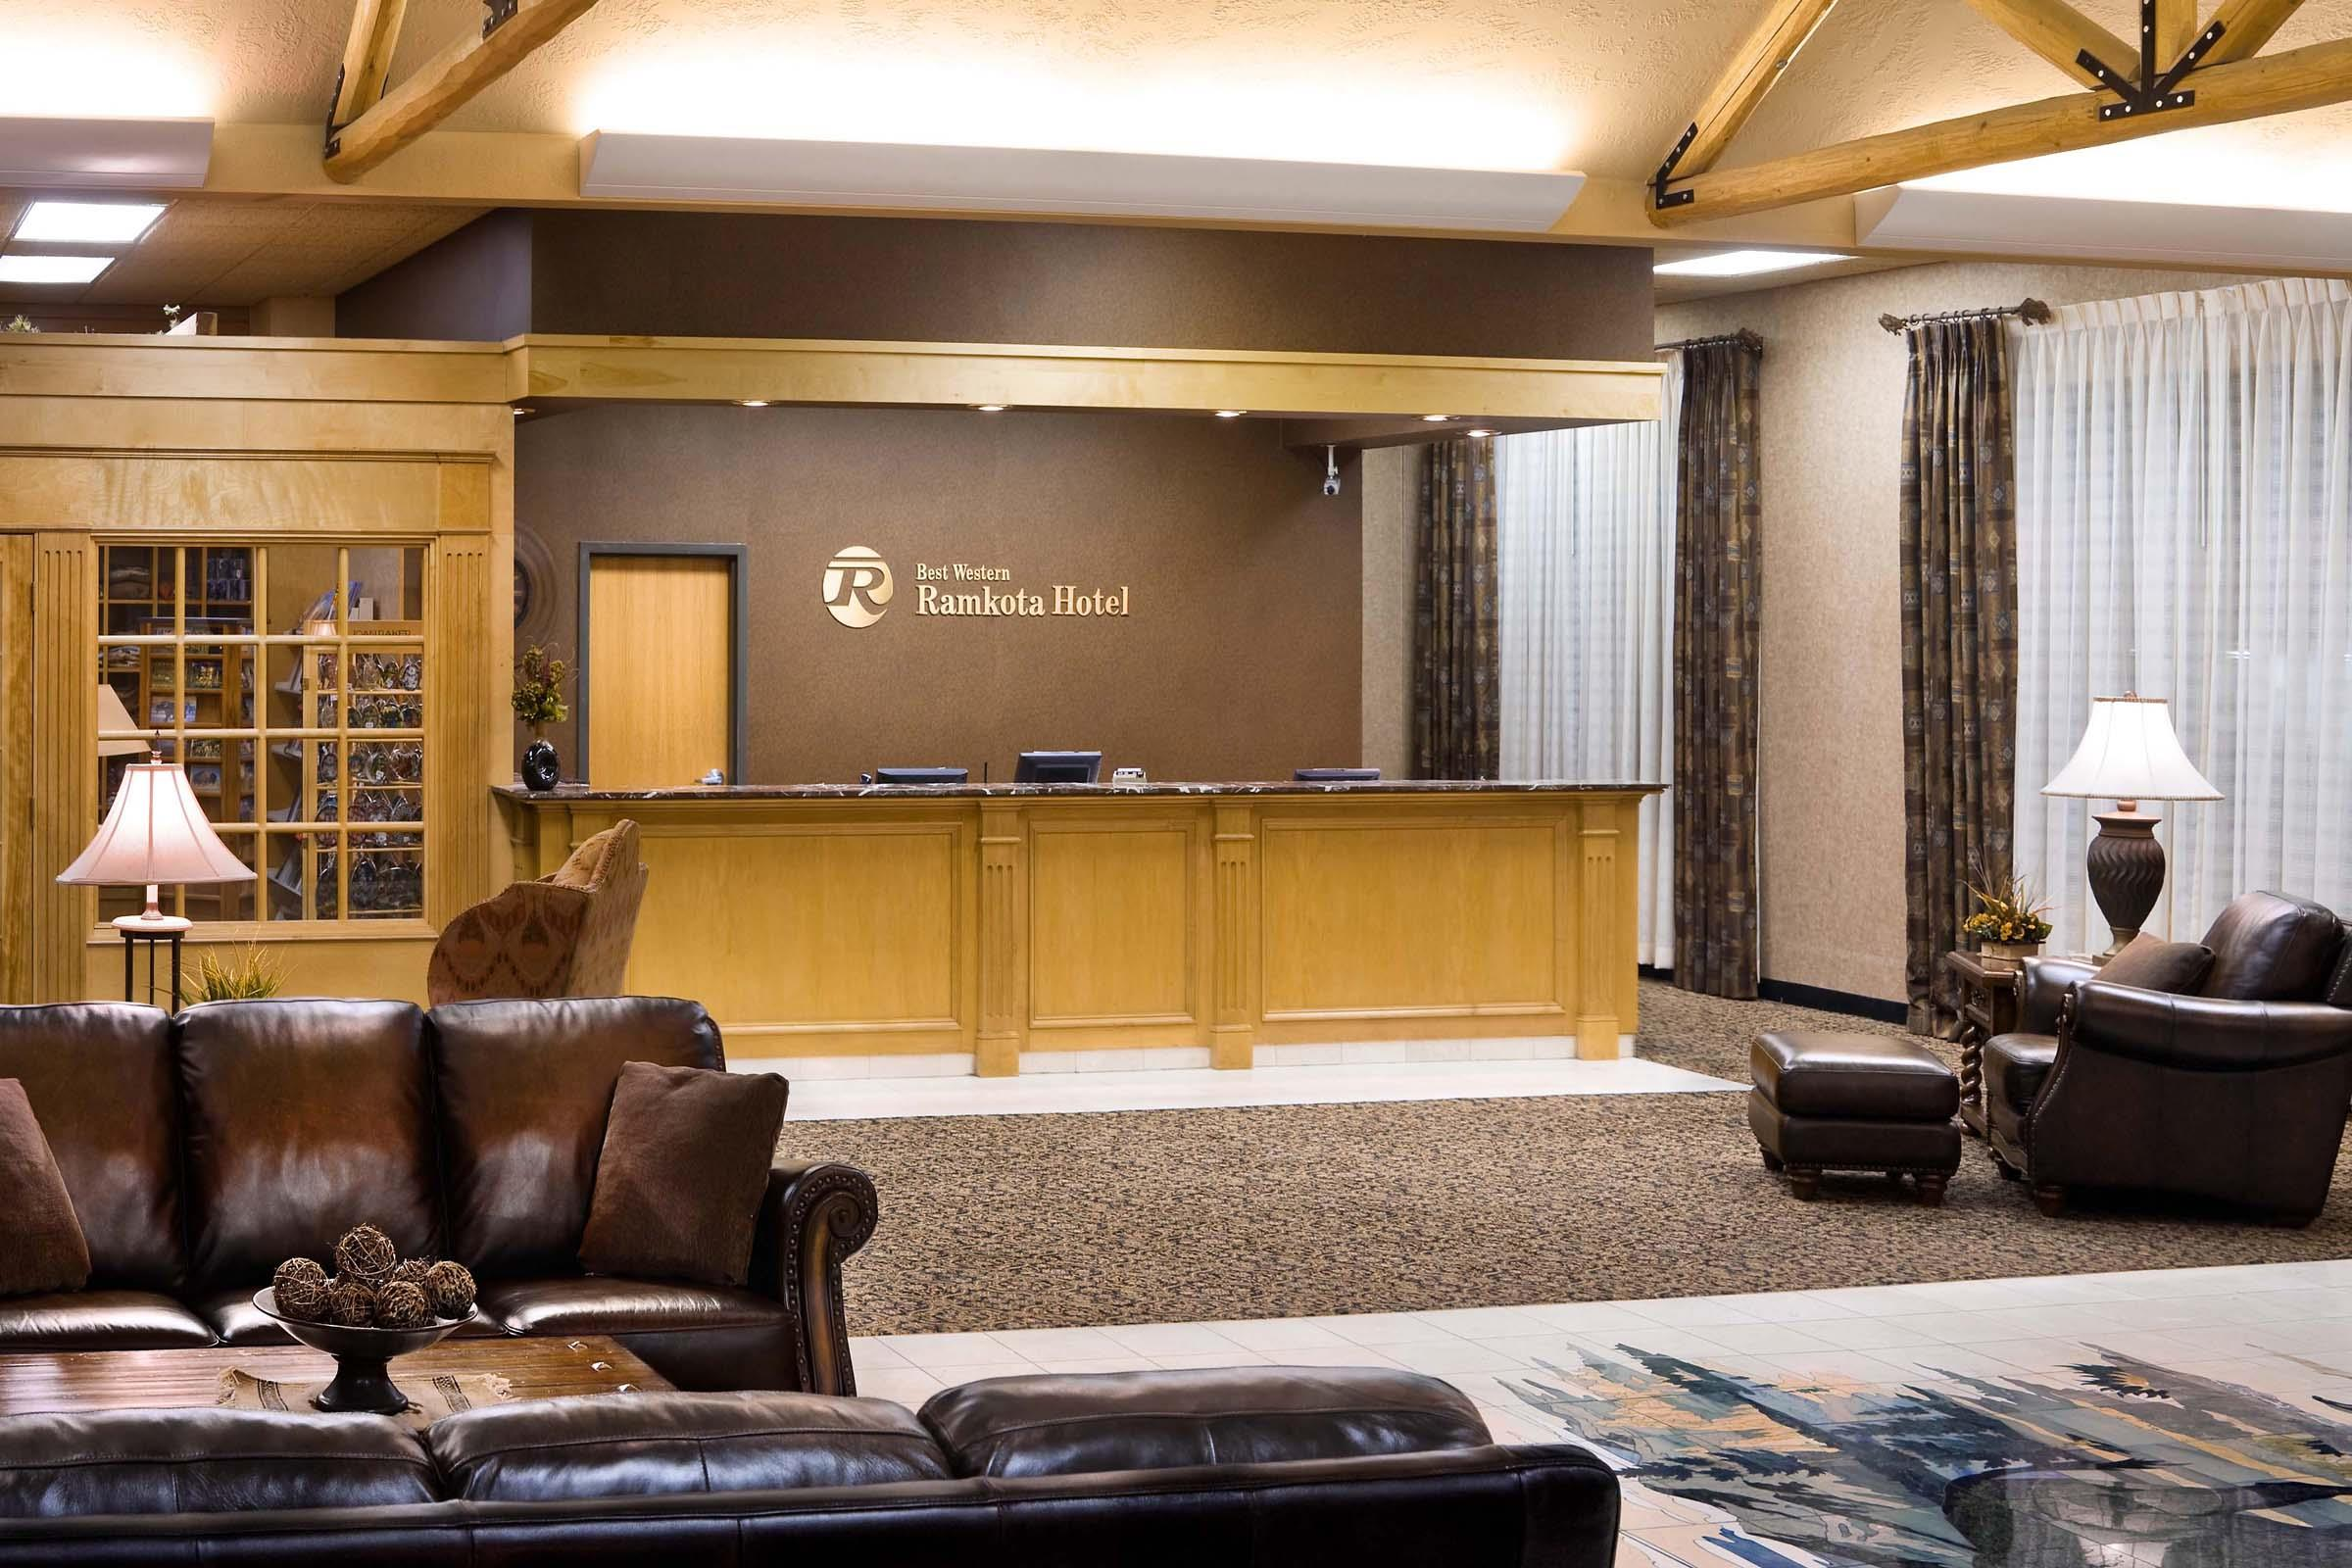 Best Western Ramkota Hotel image 21